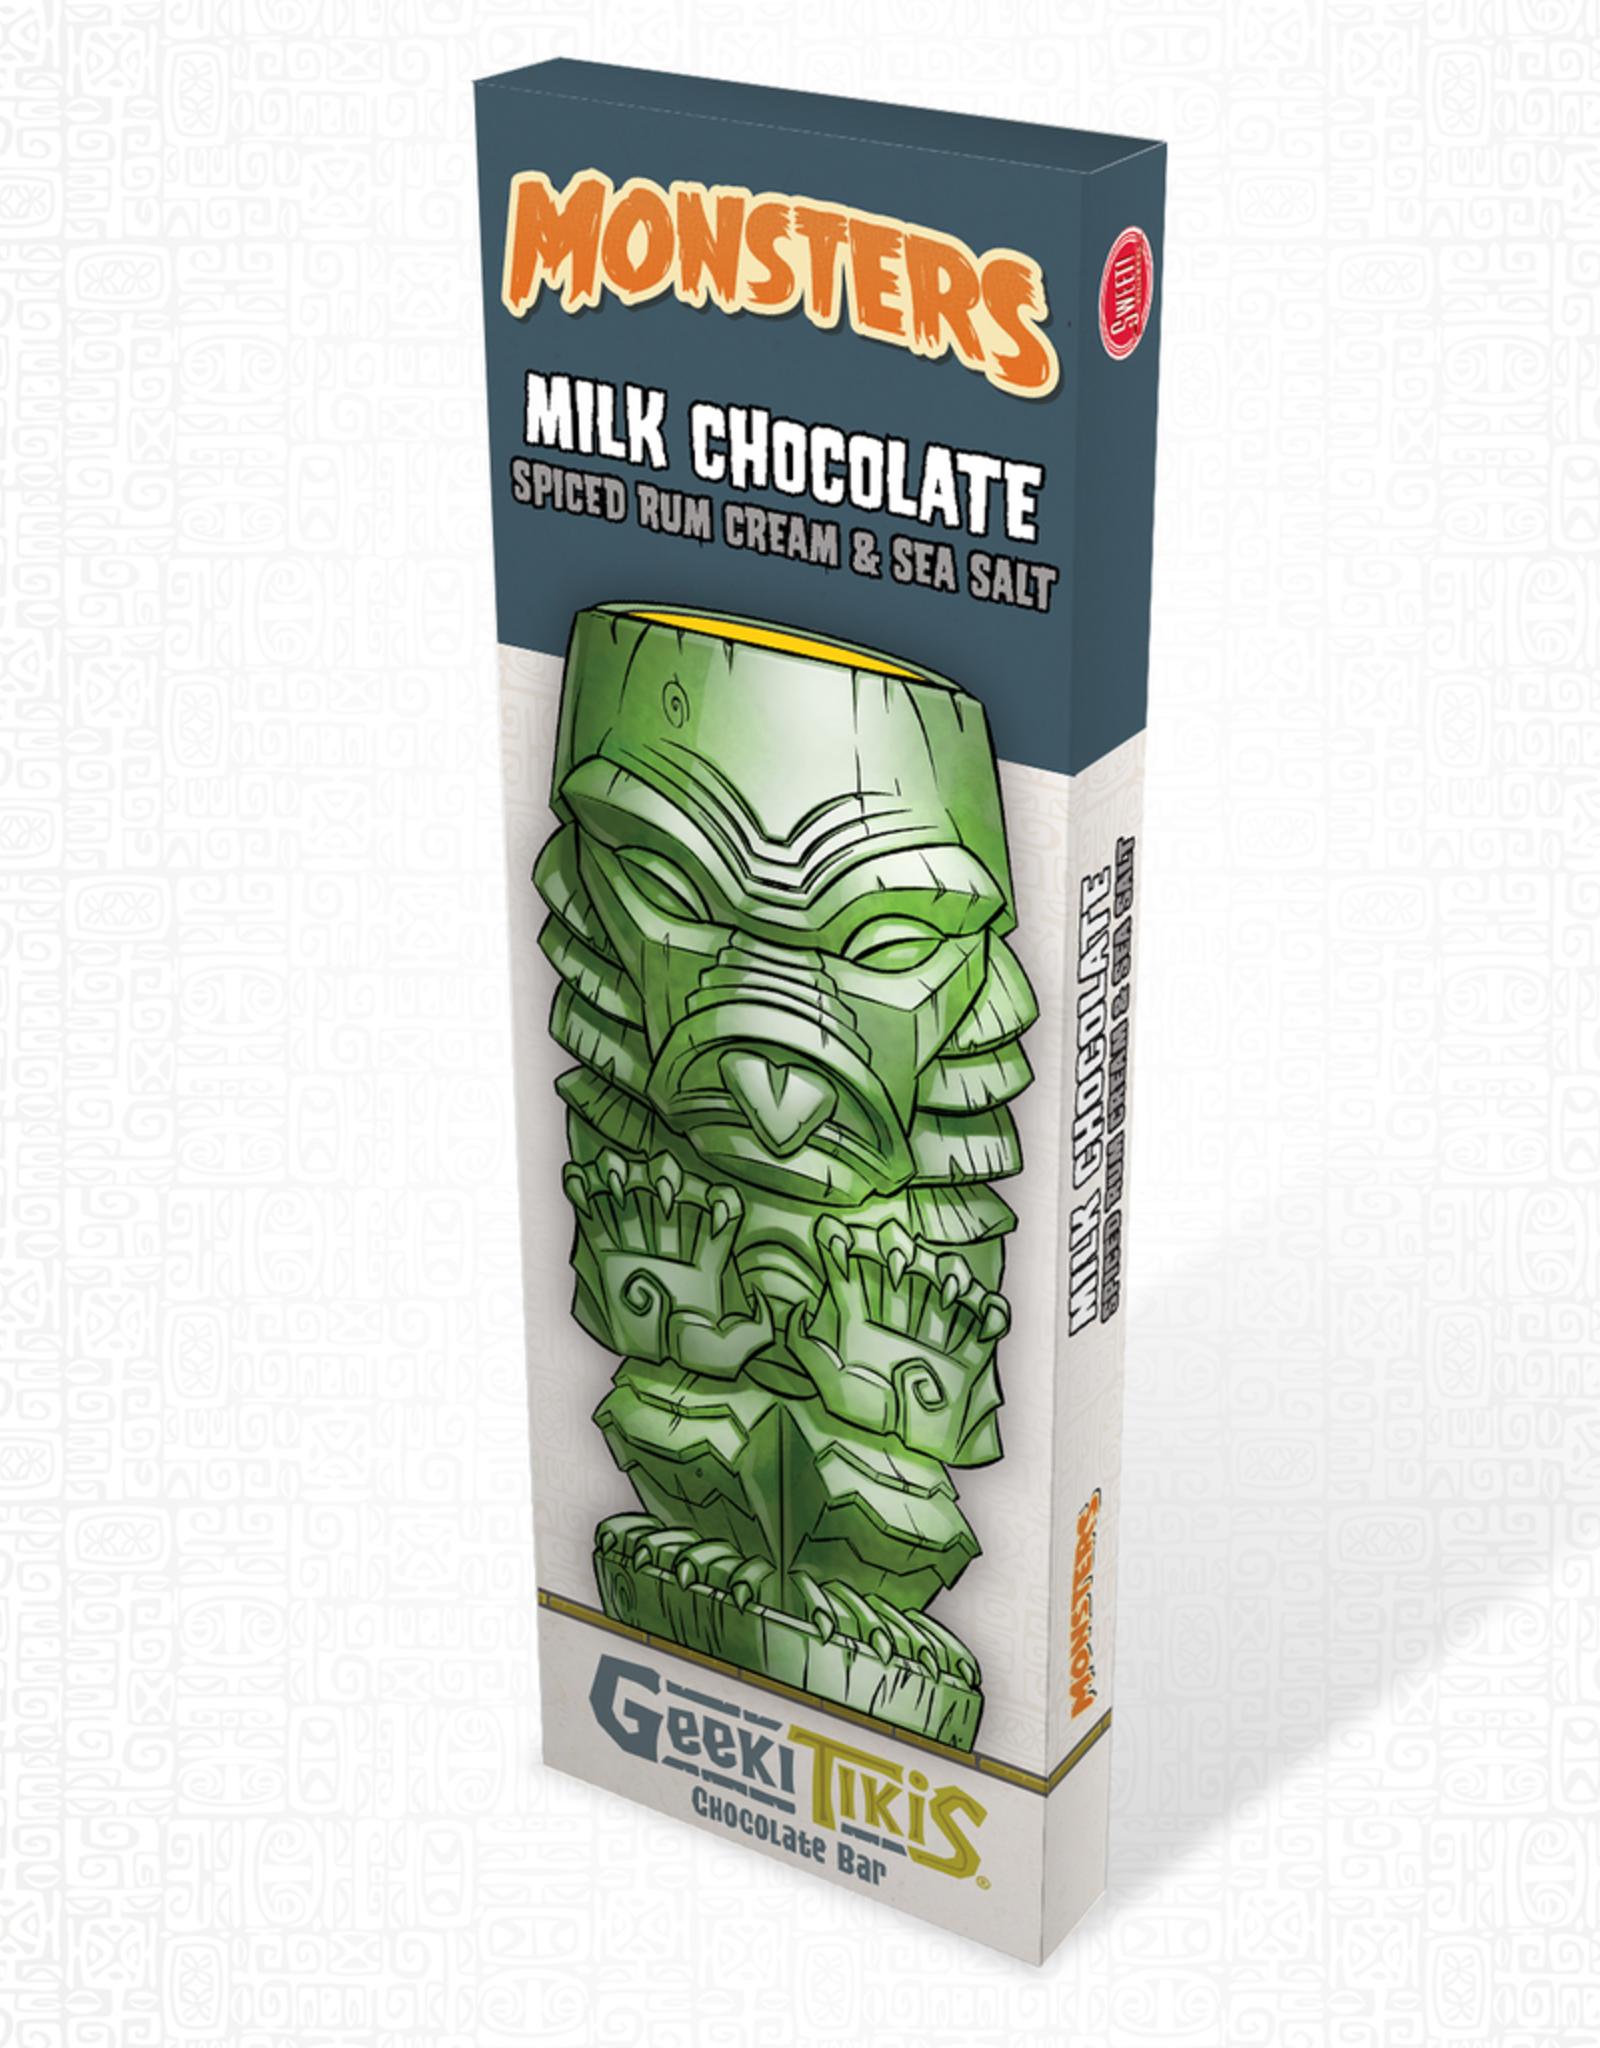 Monsters Geeki Tikis Monsters Creature from the Black Lagoon Milk Chocolate, Spiced Rum Cream, & Sea Salt